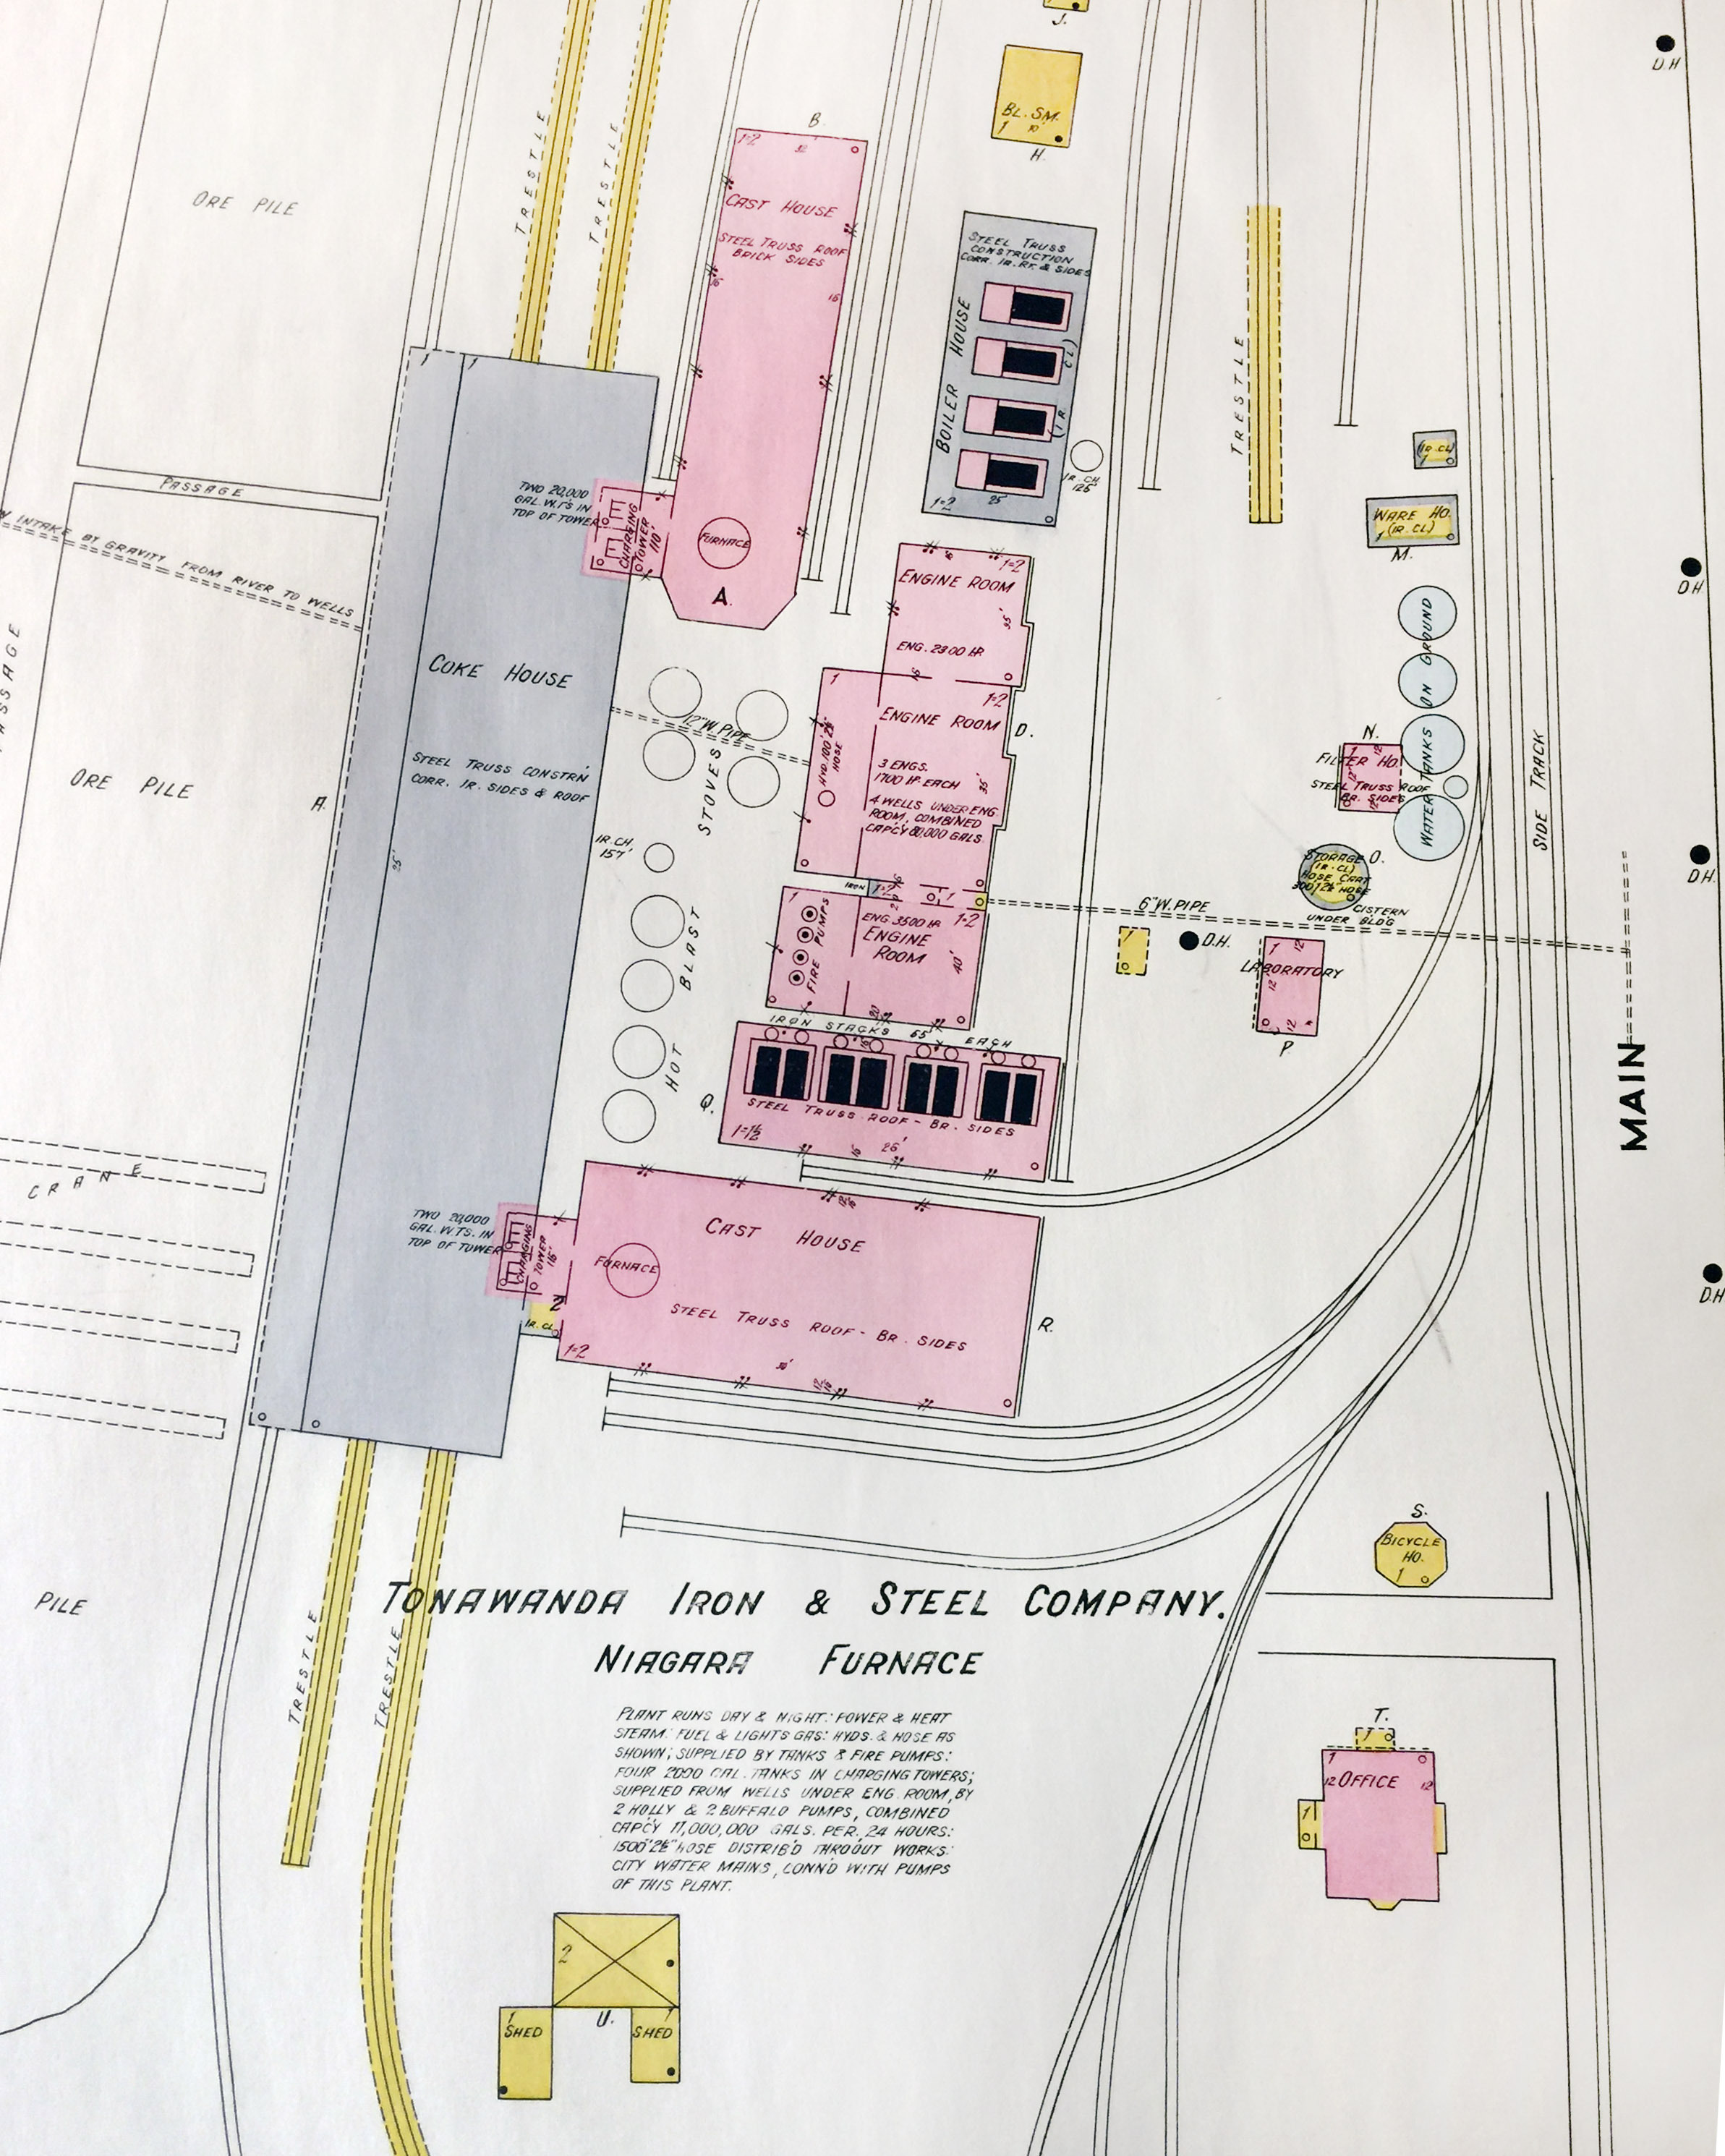 Tonawanda Iron and Steel, Niagara furnace, map detail (Sanborn Map Company, 1910, 1913).jpg